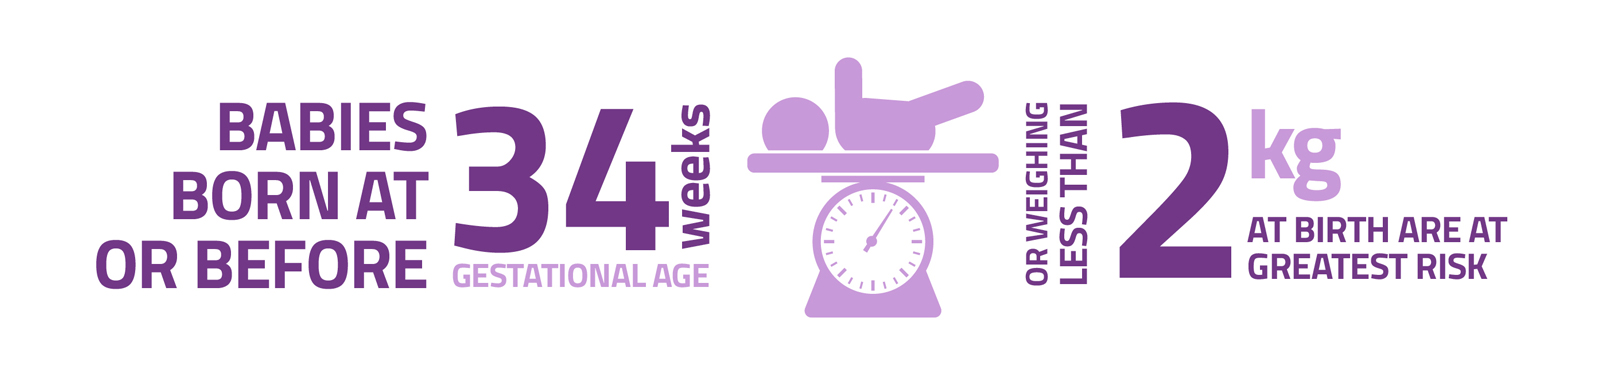 rop-2c3-babies-born-34-weeks-1600w